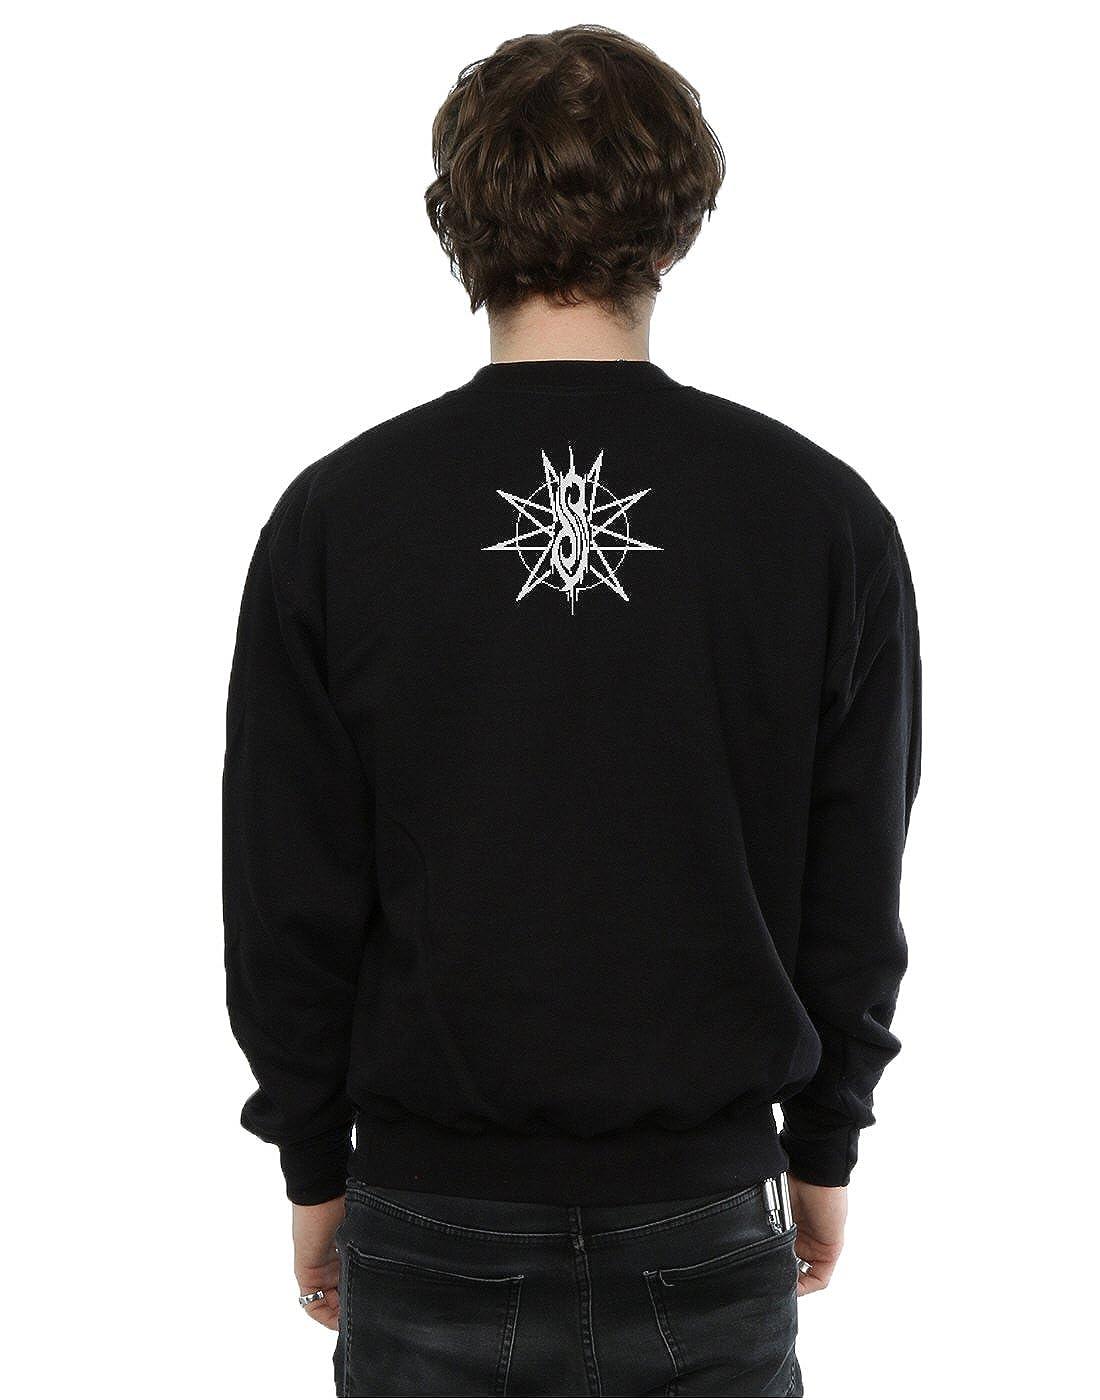 Slipknot Herren Logo Christmas Sweatshirt